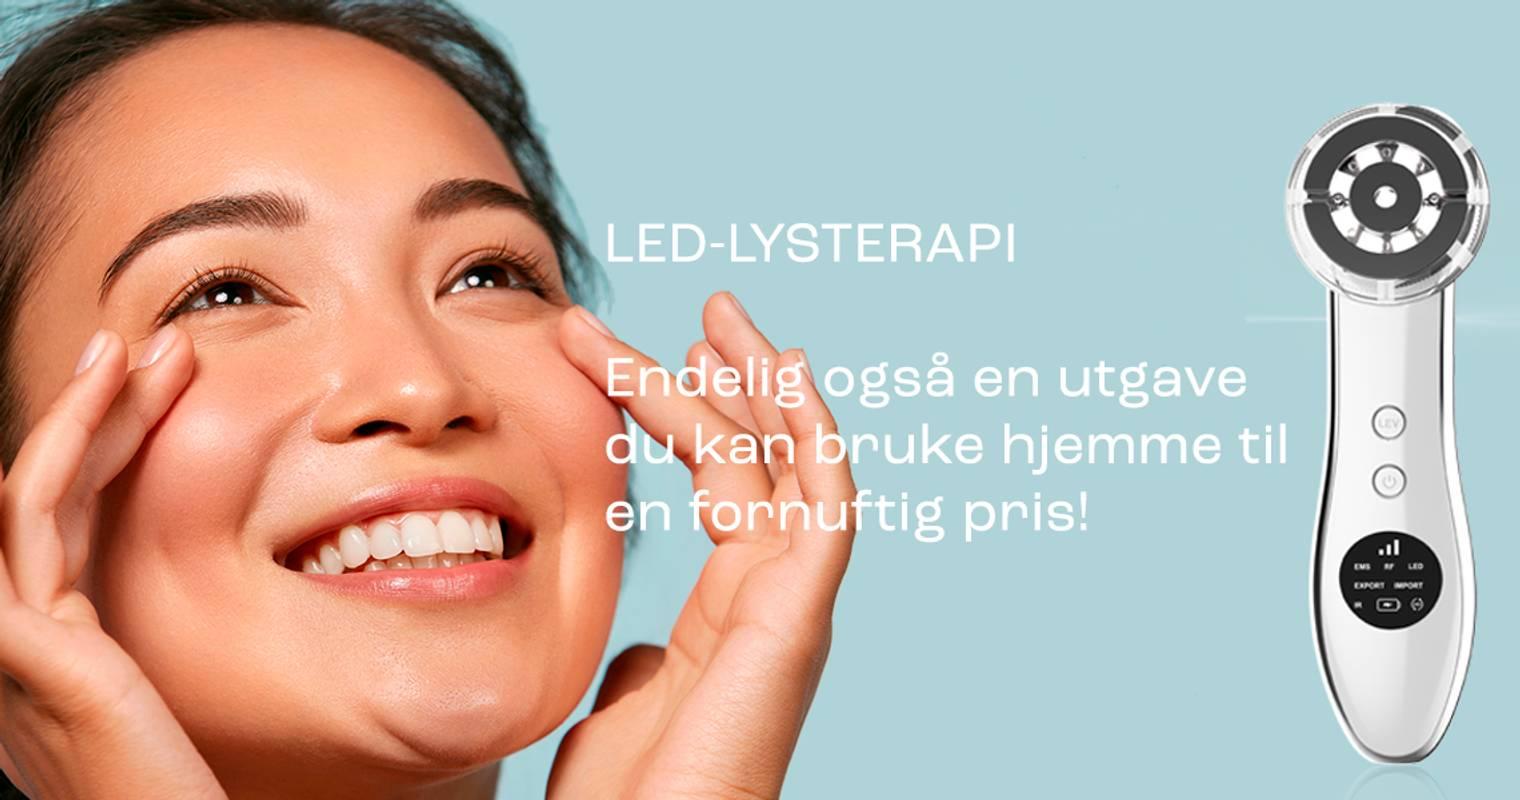 LED-lysterapi, LED-lampe, ledlampe, ledlys, led behandling